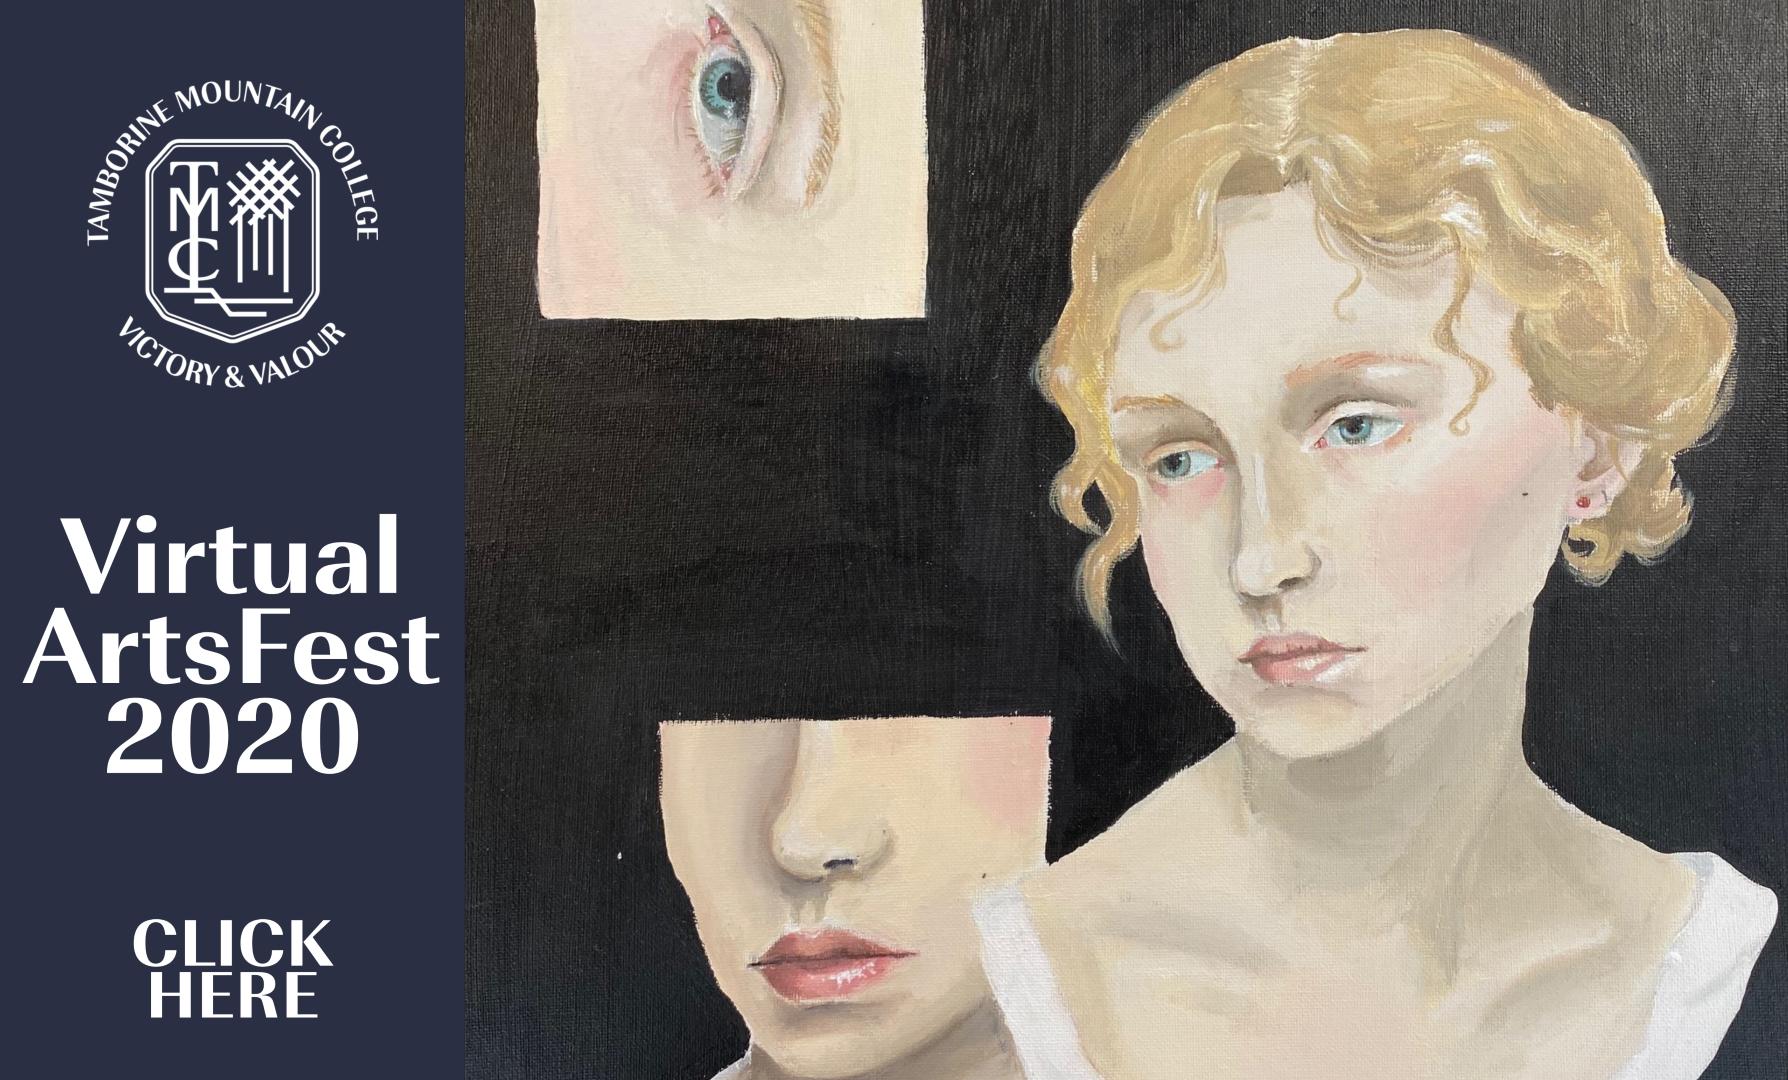 VIRTUAL ARTSFEST 2020